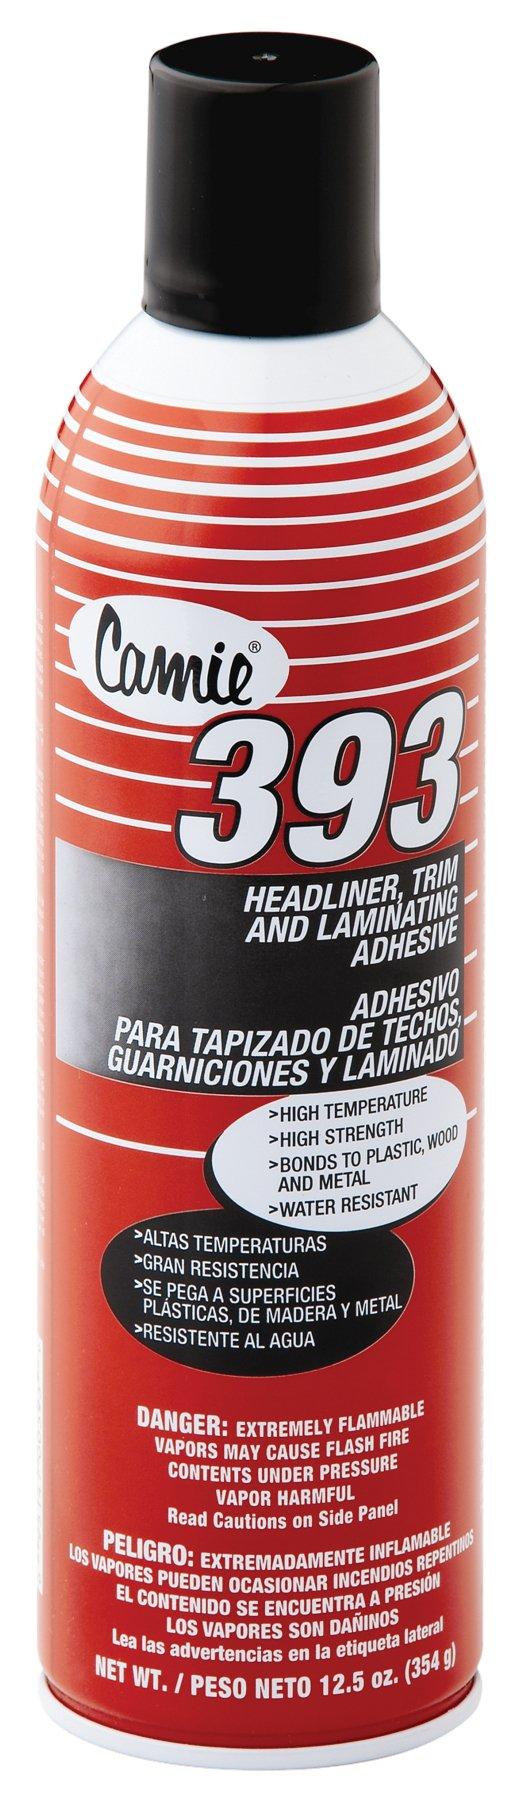 Camie 393 Headliner, Trim and Laminating Adhesive by Camie